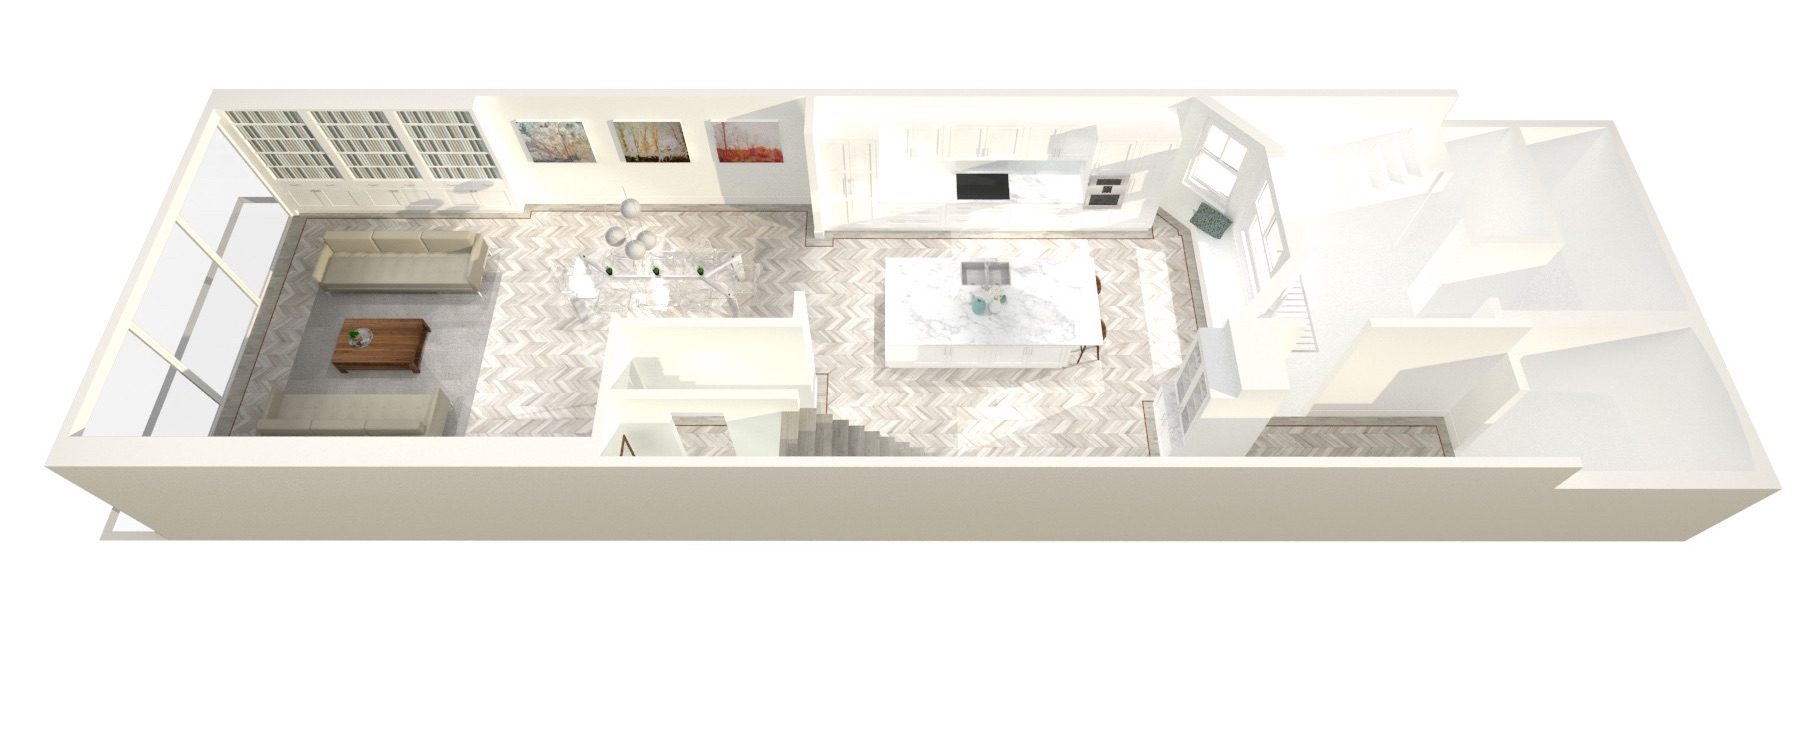 Basement Planning